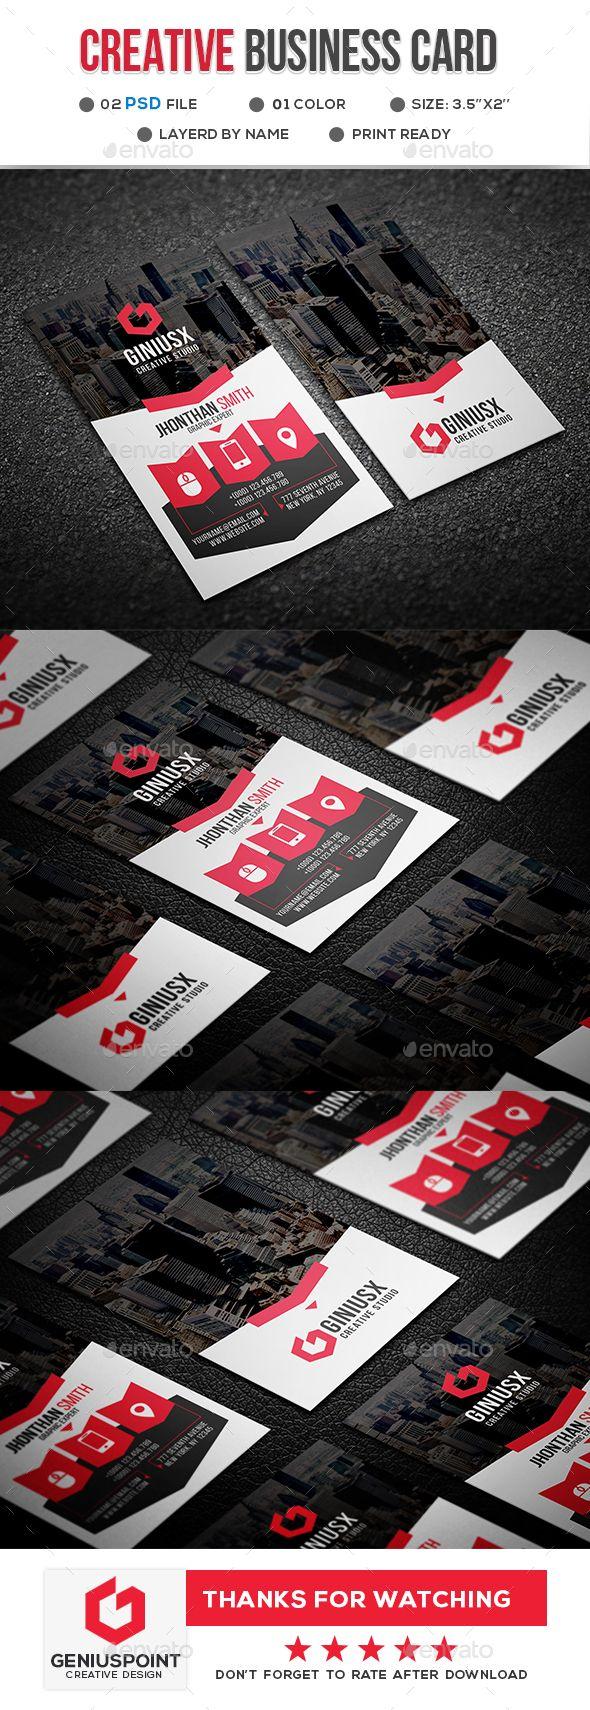 Creative Business Card - Creative Business Cards #graphicdesign #businesscards